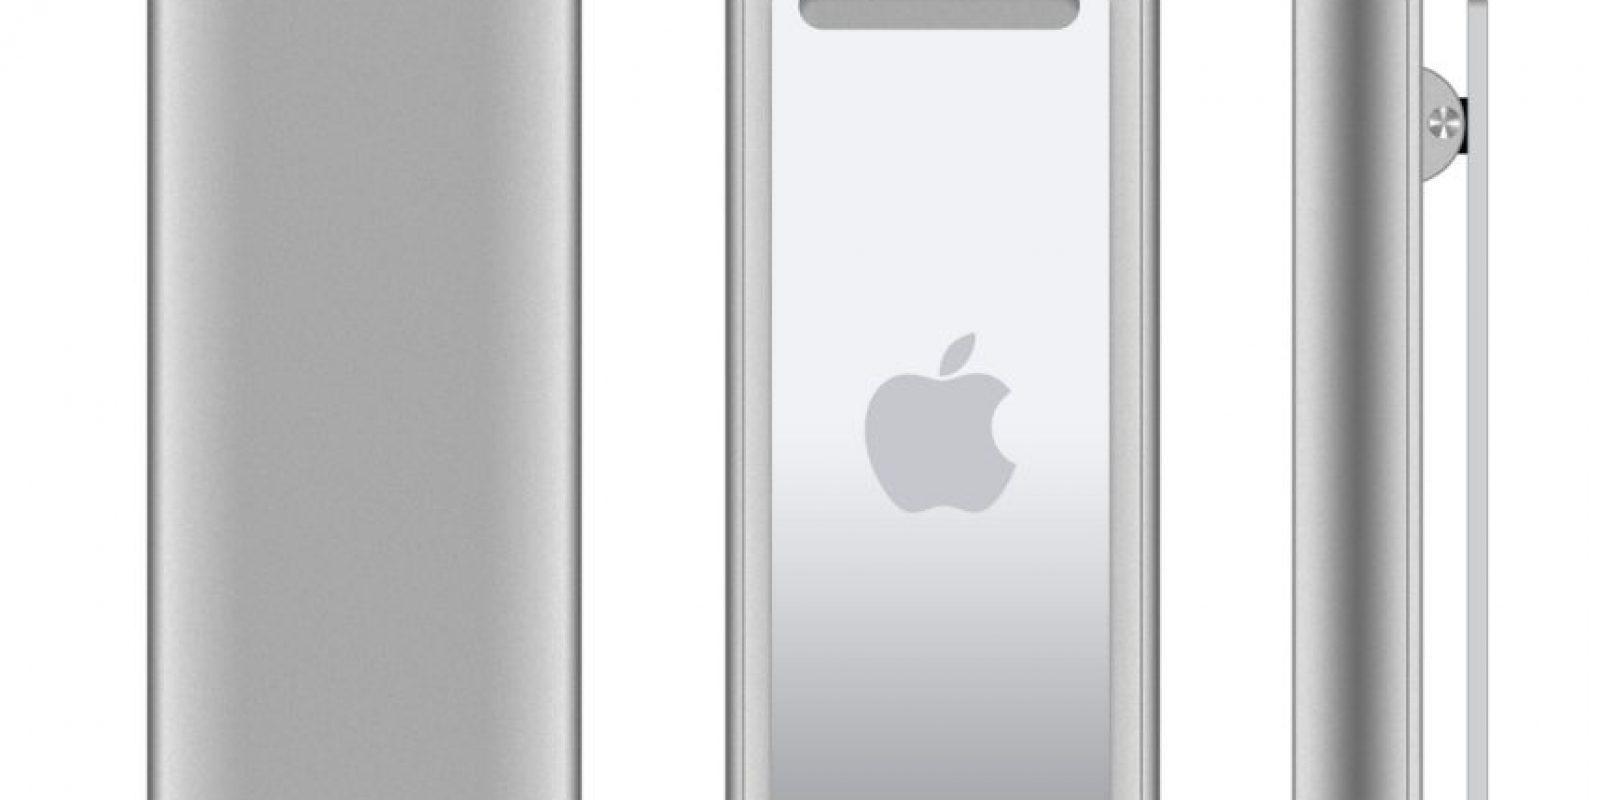 iPod shuffle Foto:Apple